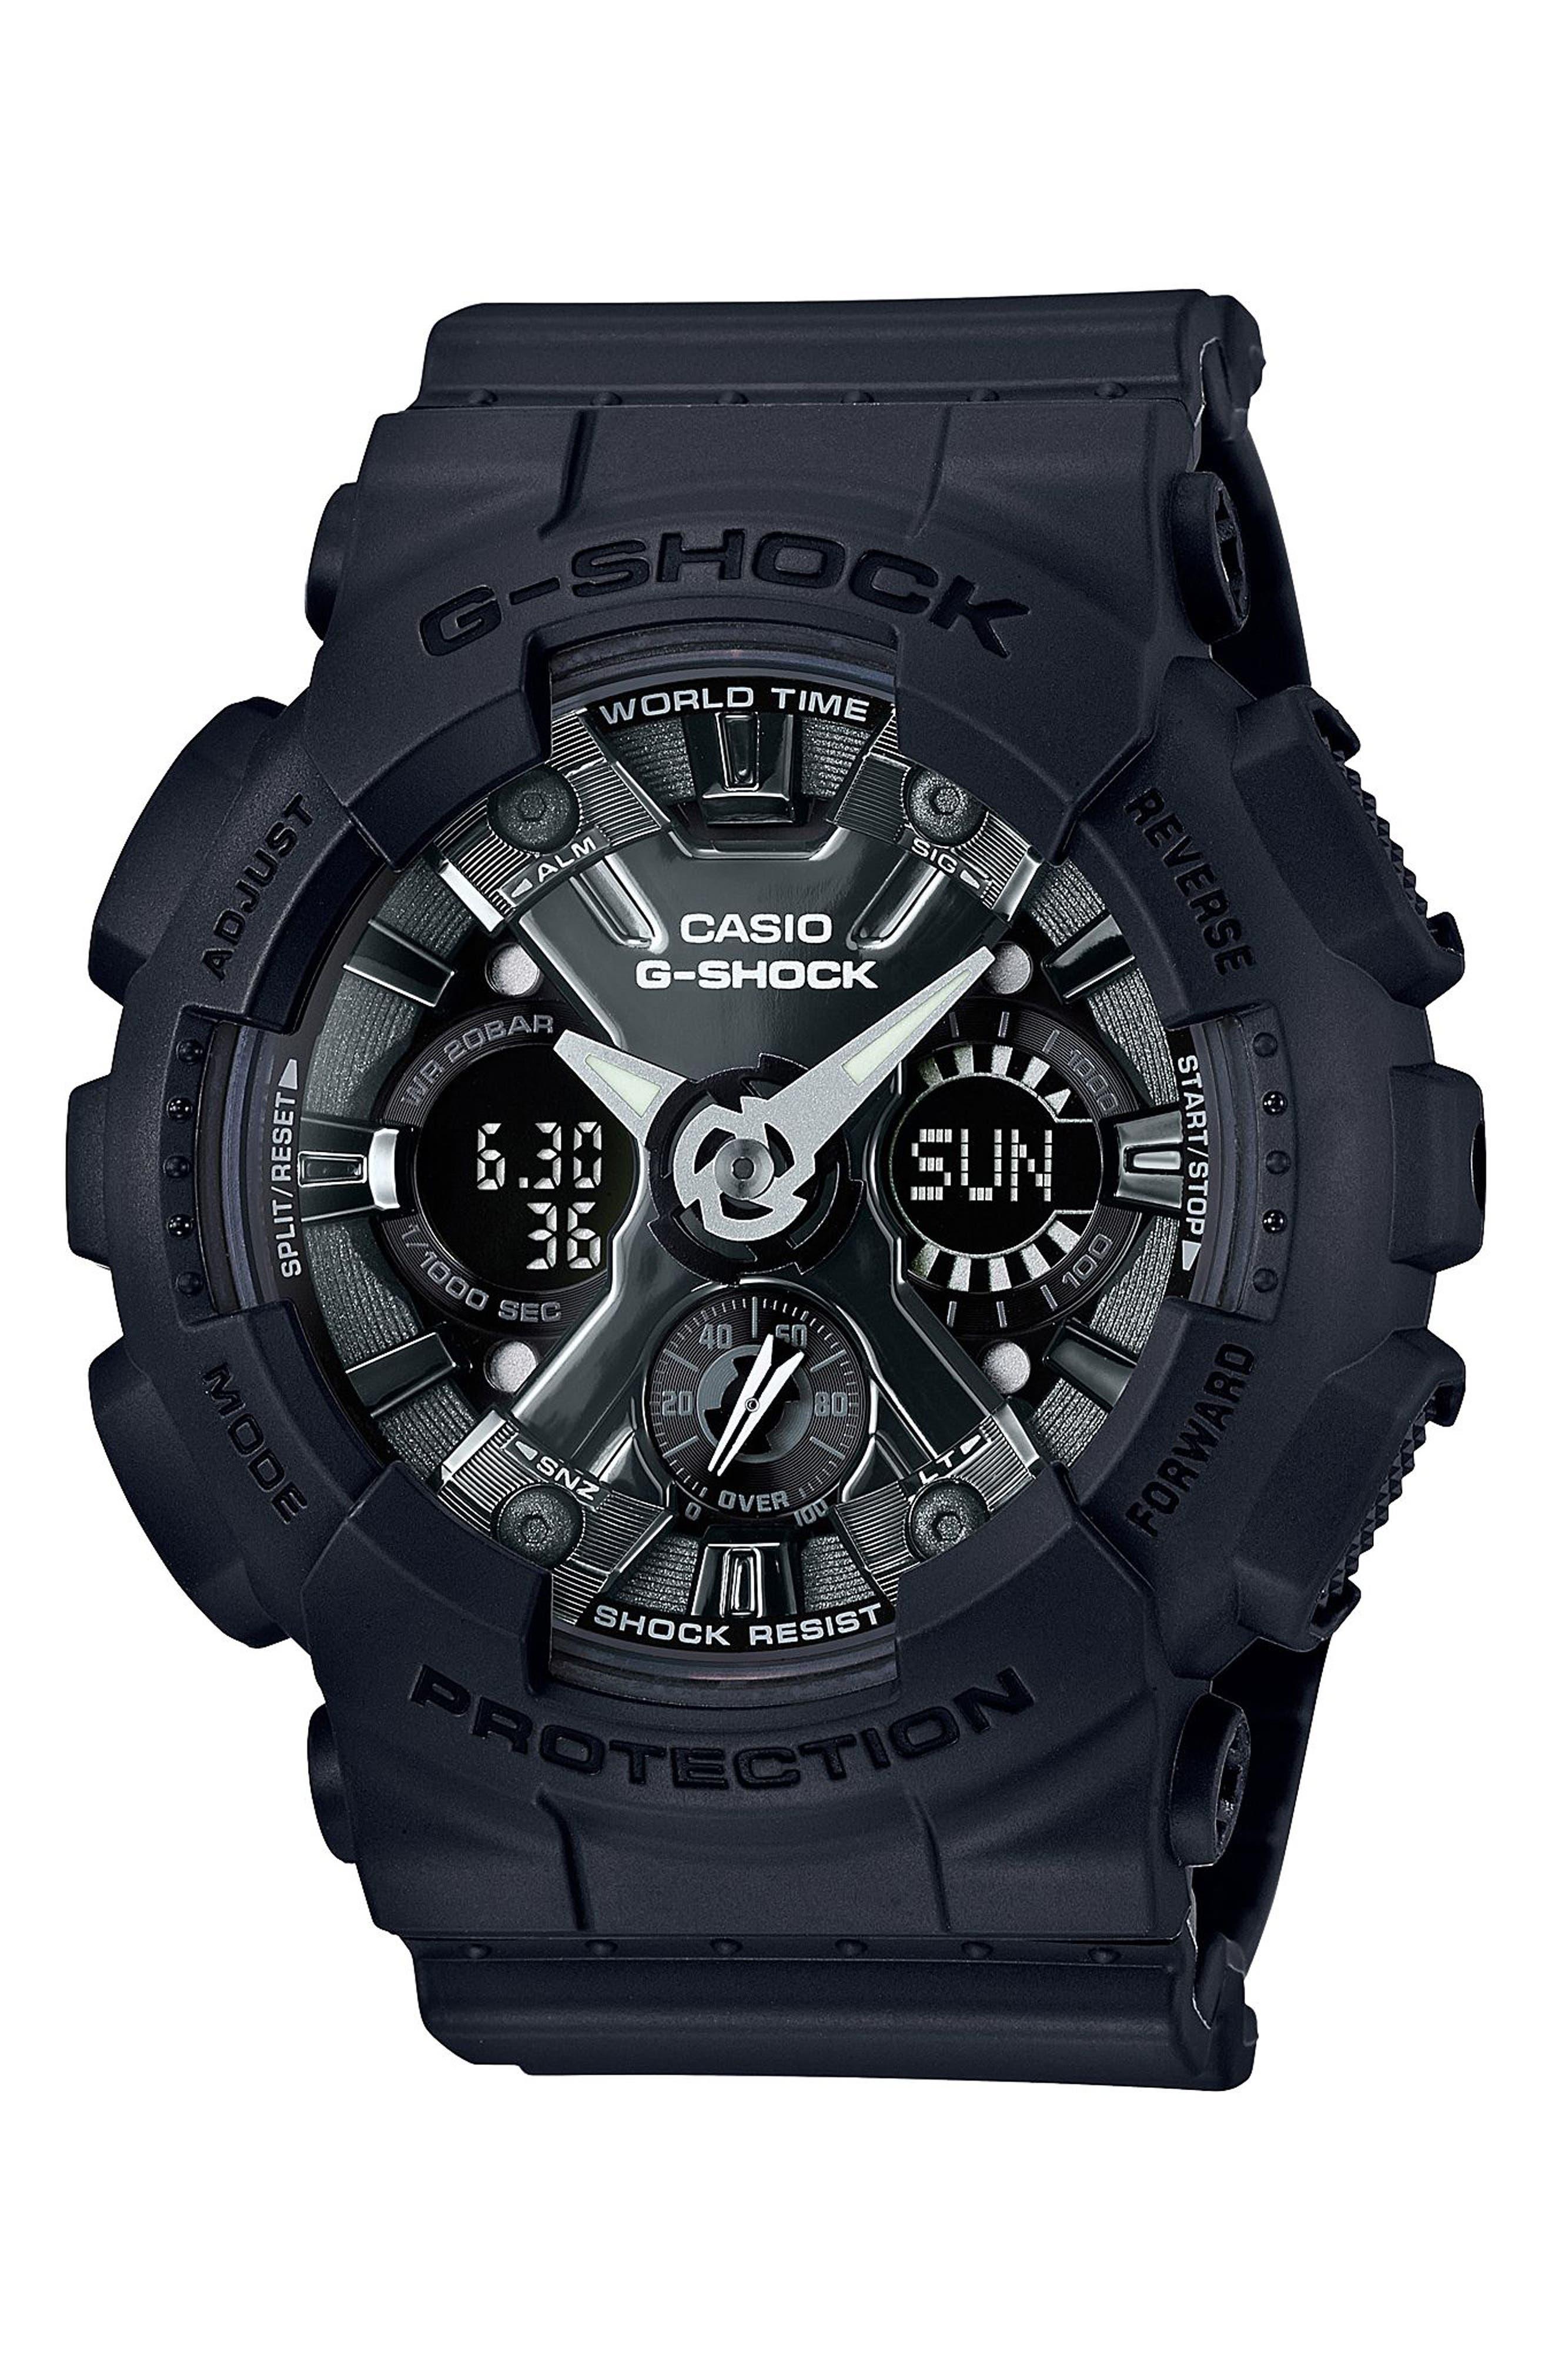 G-SHOCK BABY-G, G-Shock S-Series Ana-Digi Watch, 49mm, Main thumbnail 1, color, BLACK/ GREY